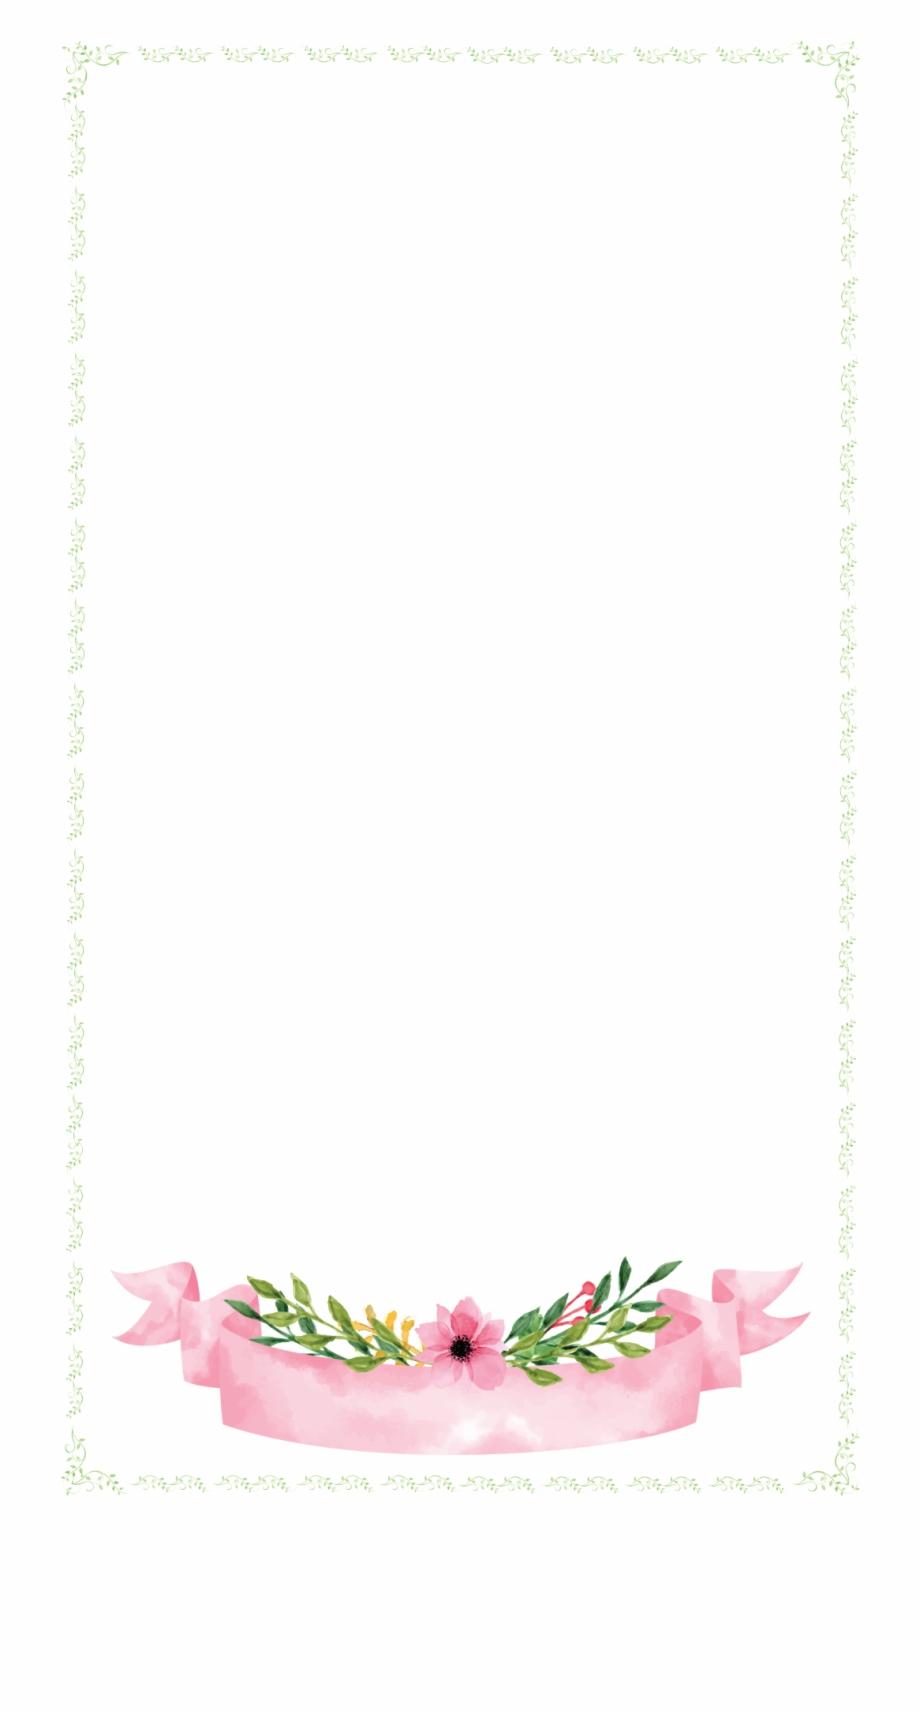 Snapchat Filters Clipart Floral Honeysuckle Transparent